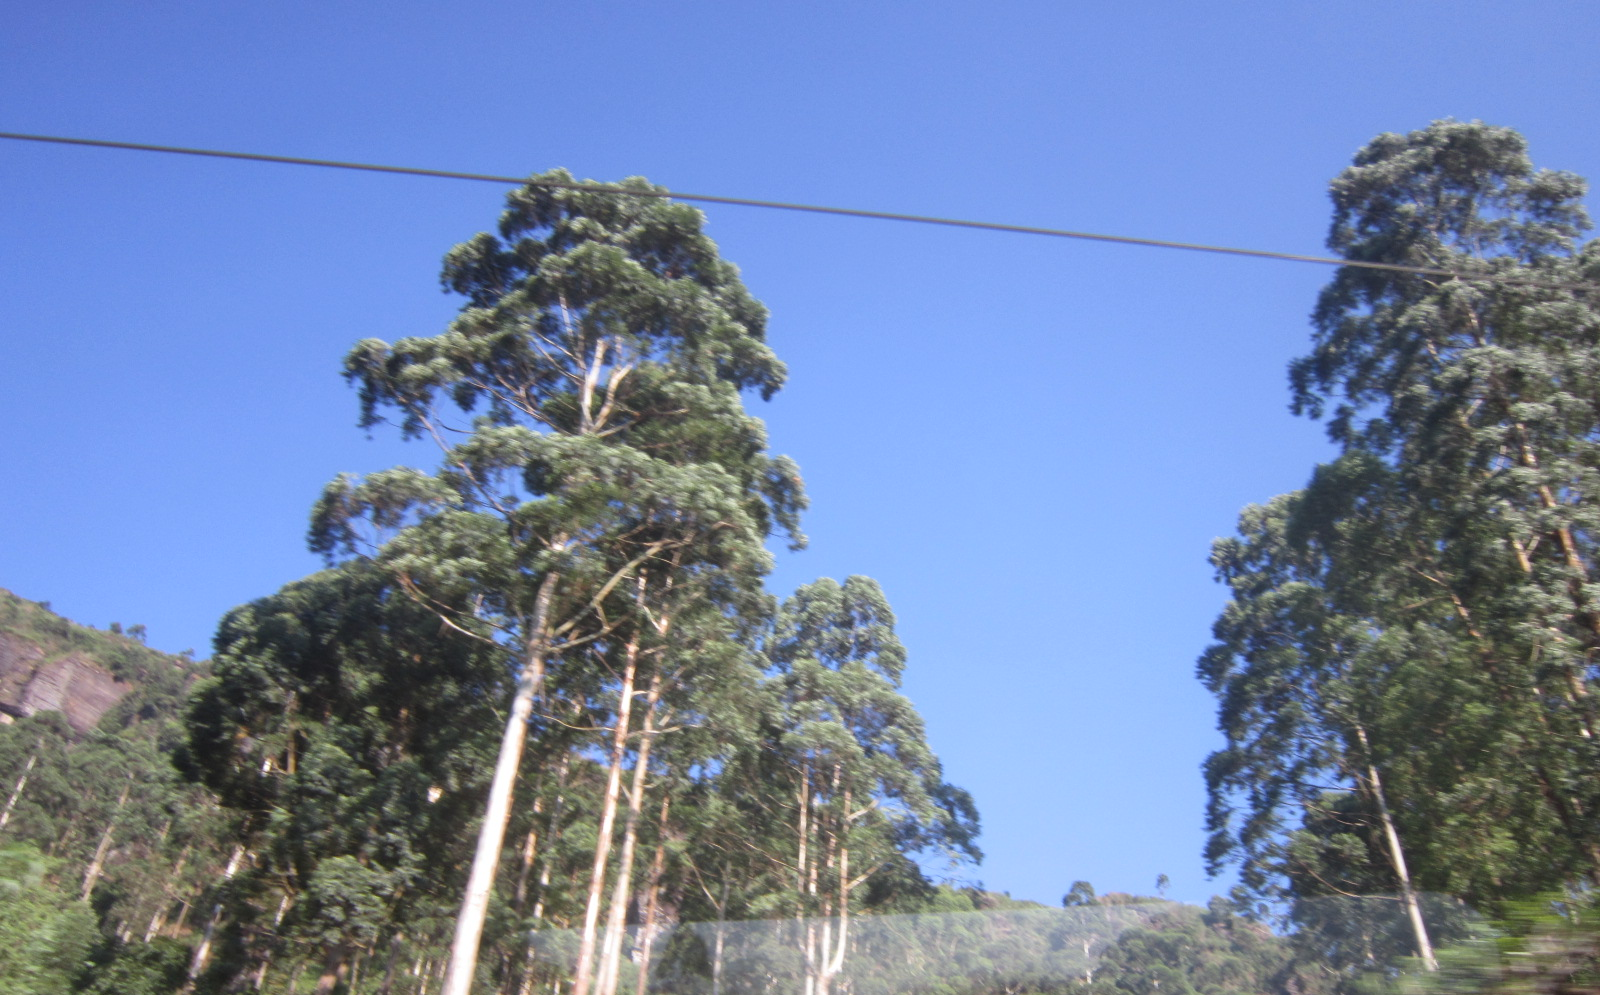 Image441.jpg